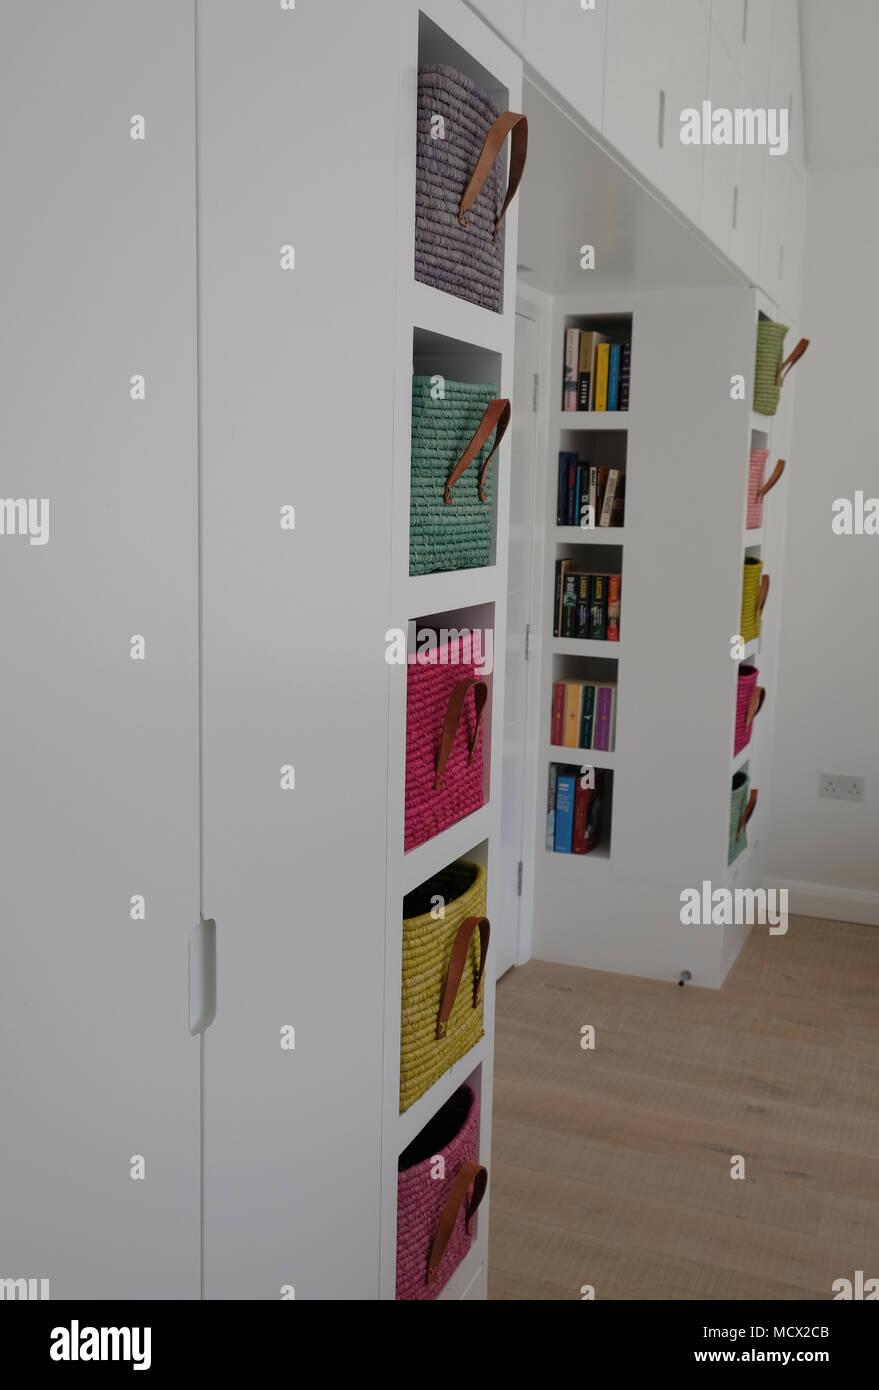 Scandinavian inspired, light-filled bedroom interior showing ...